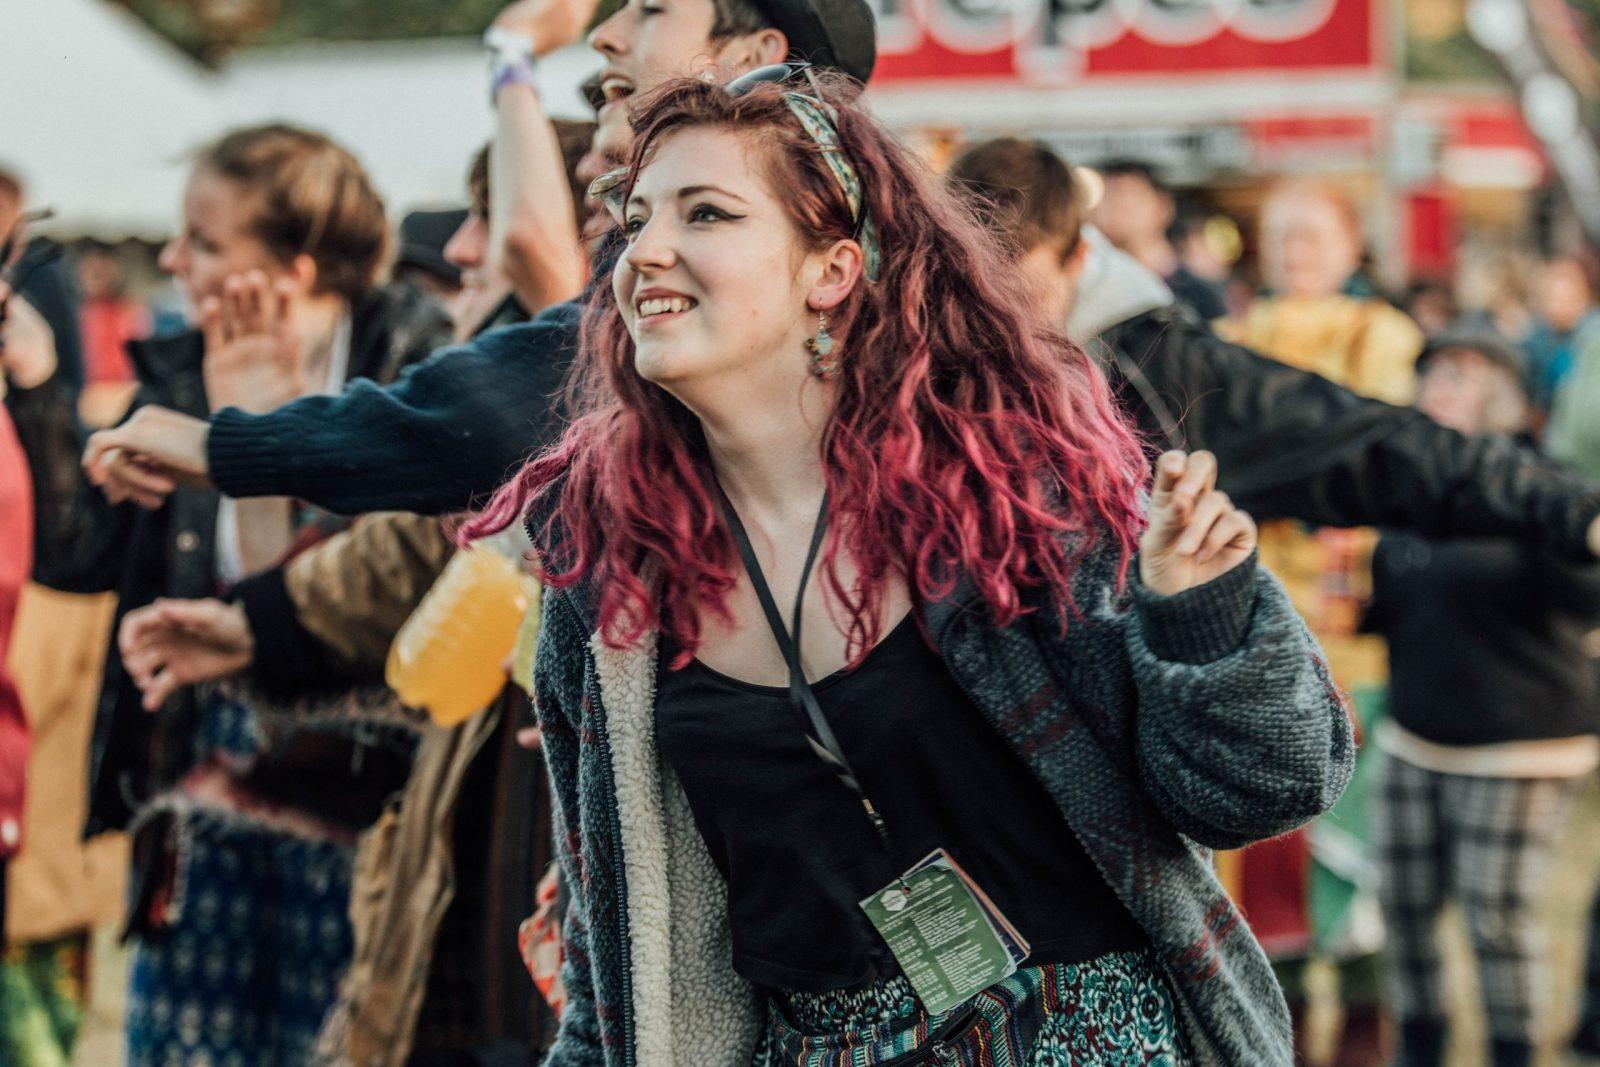 Sunflowerfest 2016- Tubbys Farm, Music, Event Photography, cmcguigan photography, Chris McGuigan Photography, Belfast Photographer